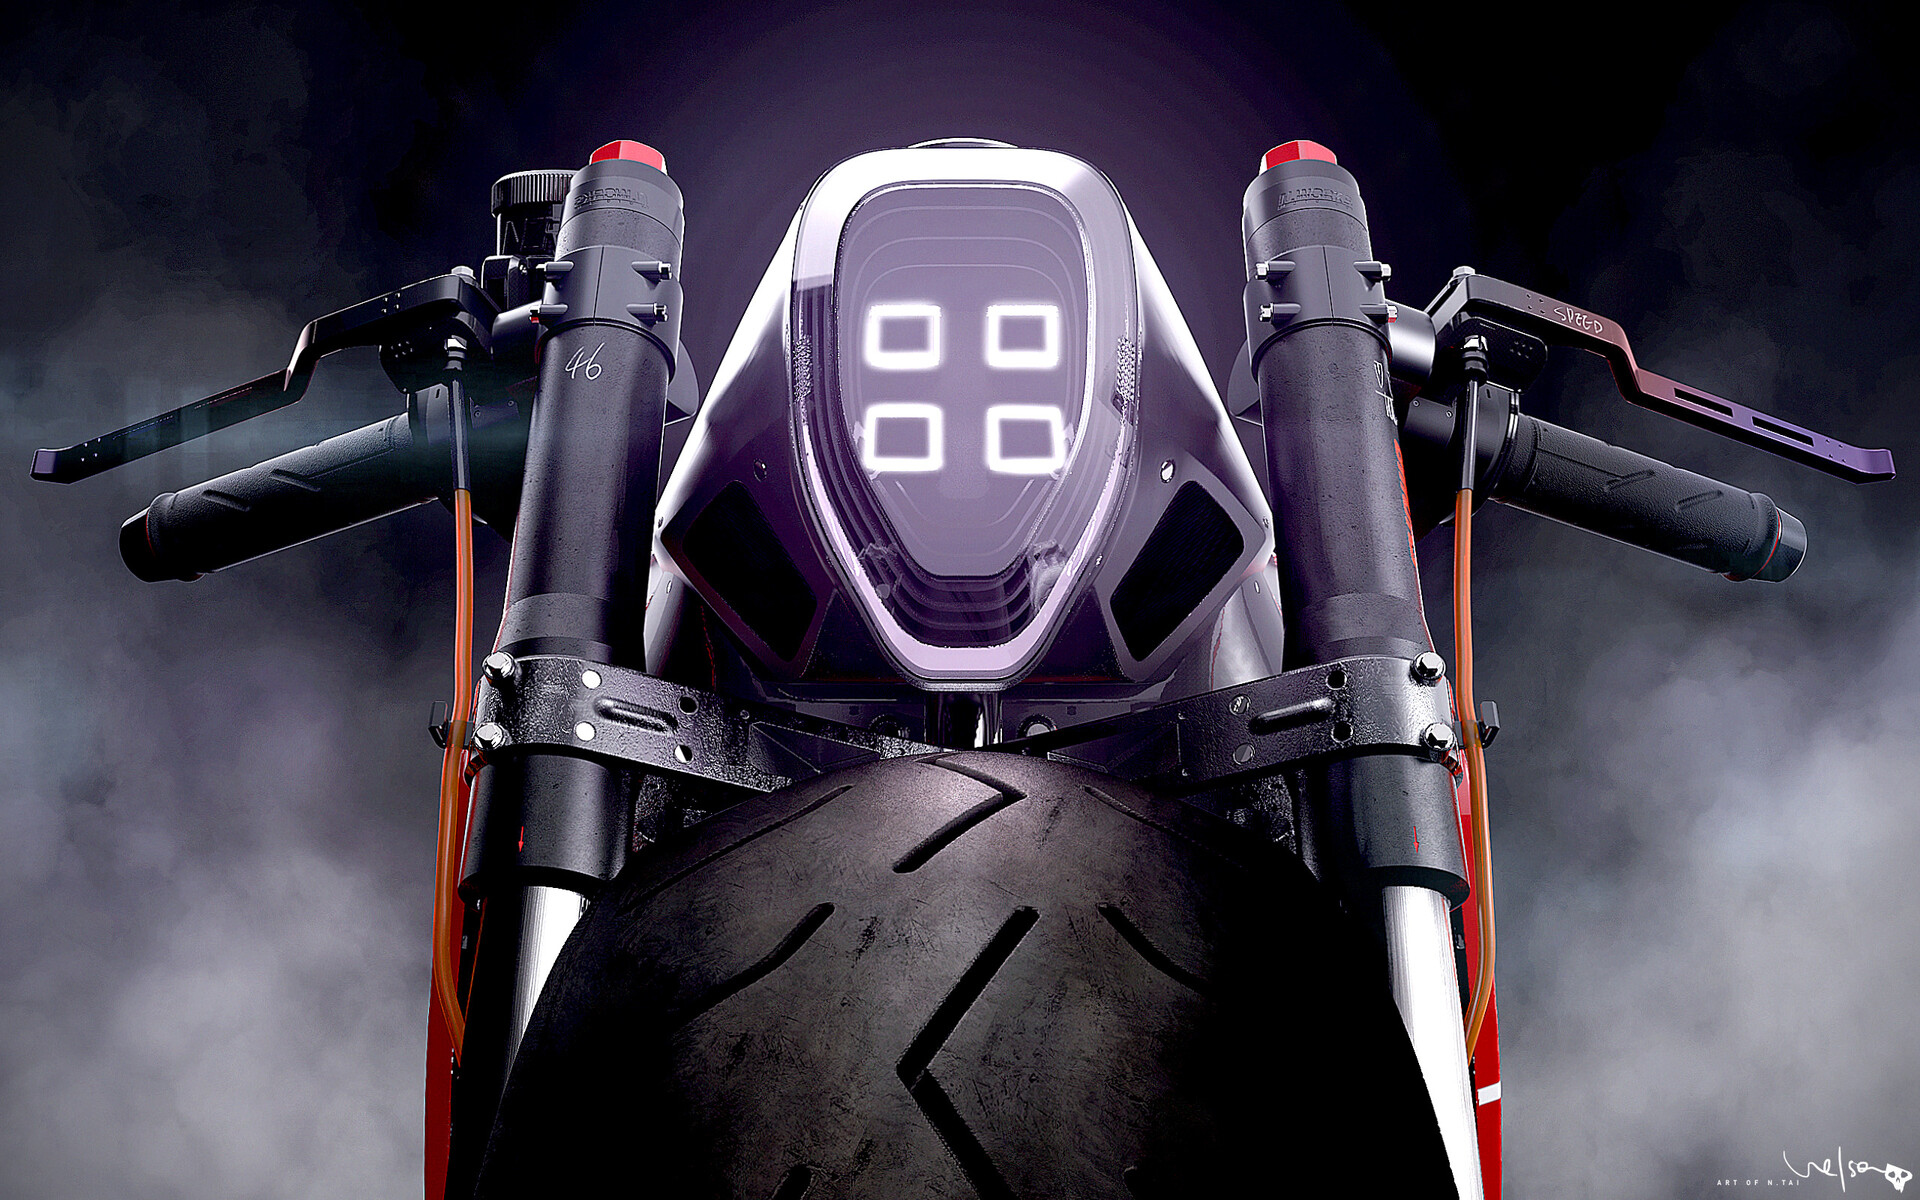 Nelson tai nzr500 dsgn bike hex 001a